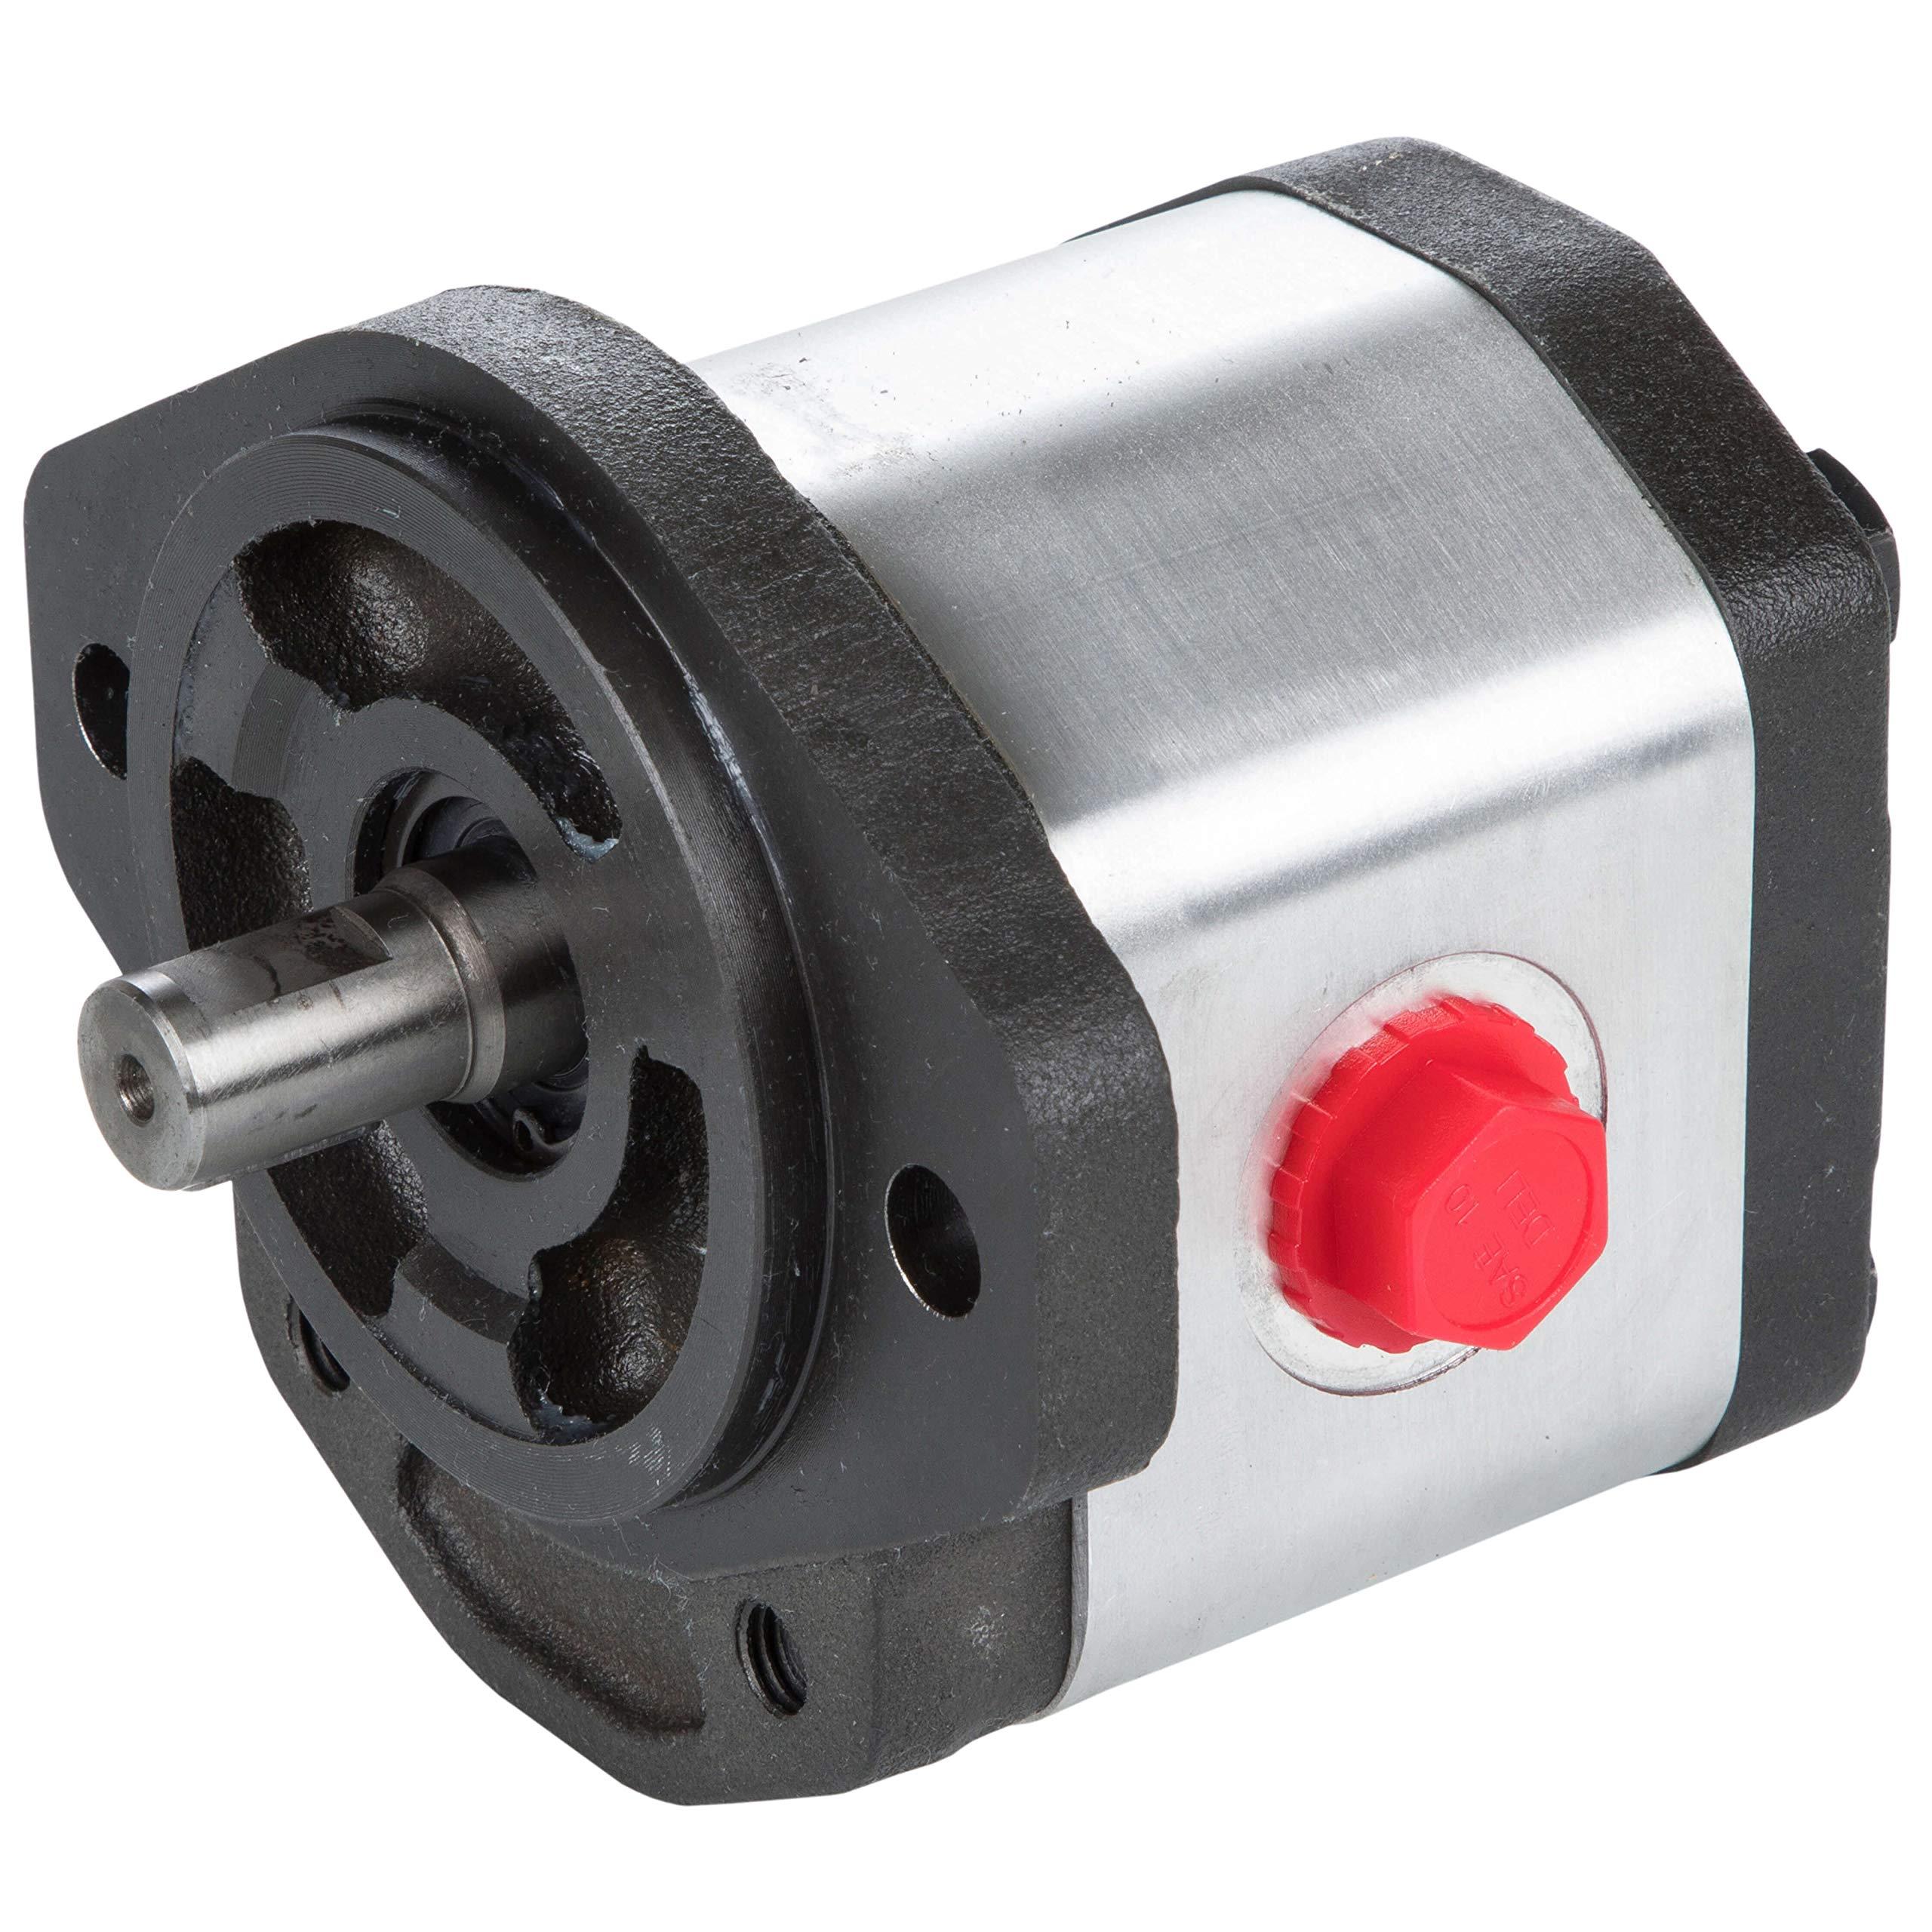 RuggedMade Hydraulic Gear Pump, 9 GPM Single Stage, Clockwise Rotation, 3600 PSI